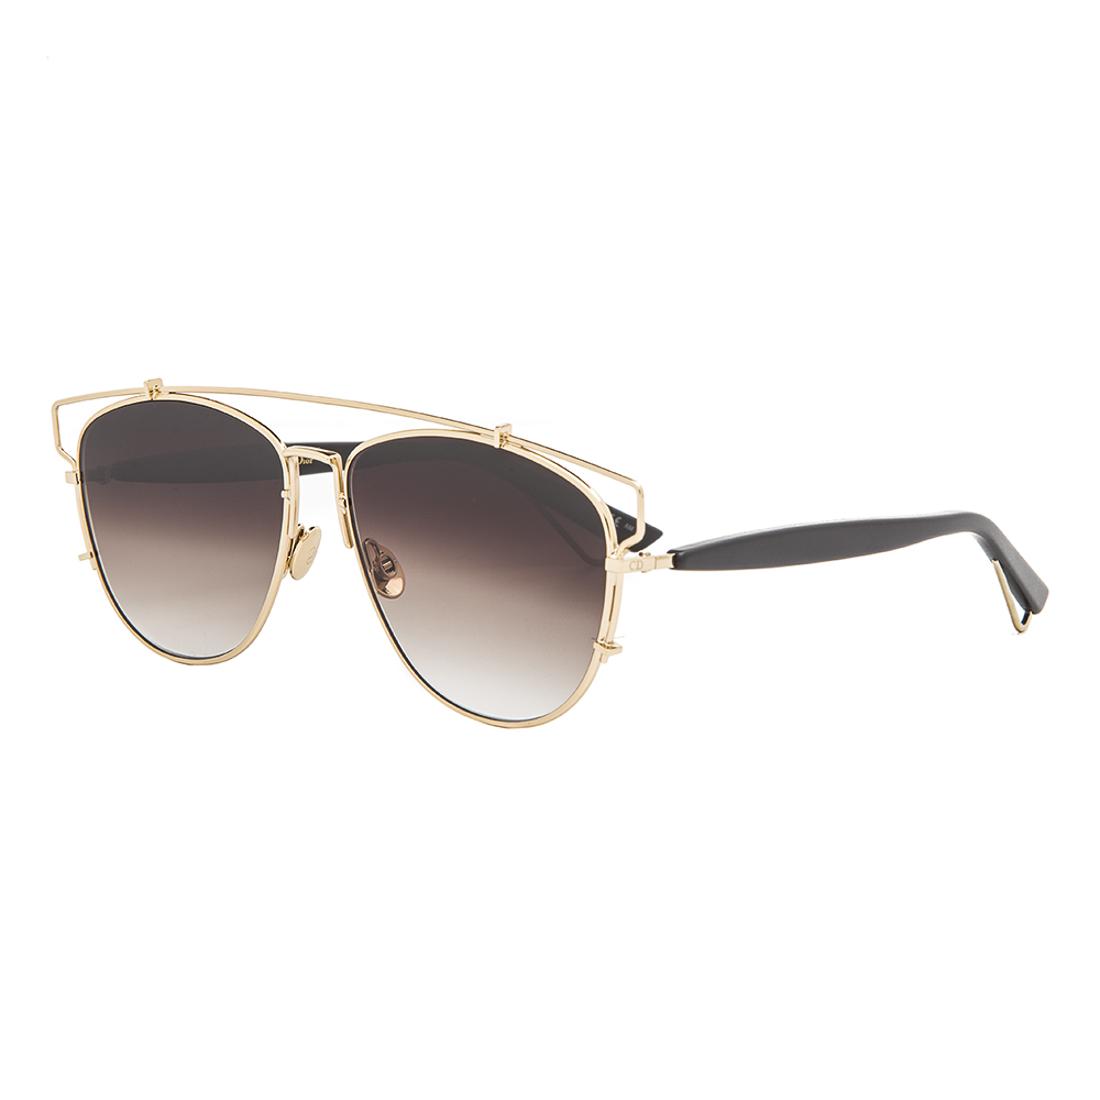 Dior Black Frame Glasses : Dior Technologic Aviator Sunglasses RHL86 Gold Black Frame ...